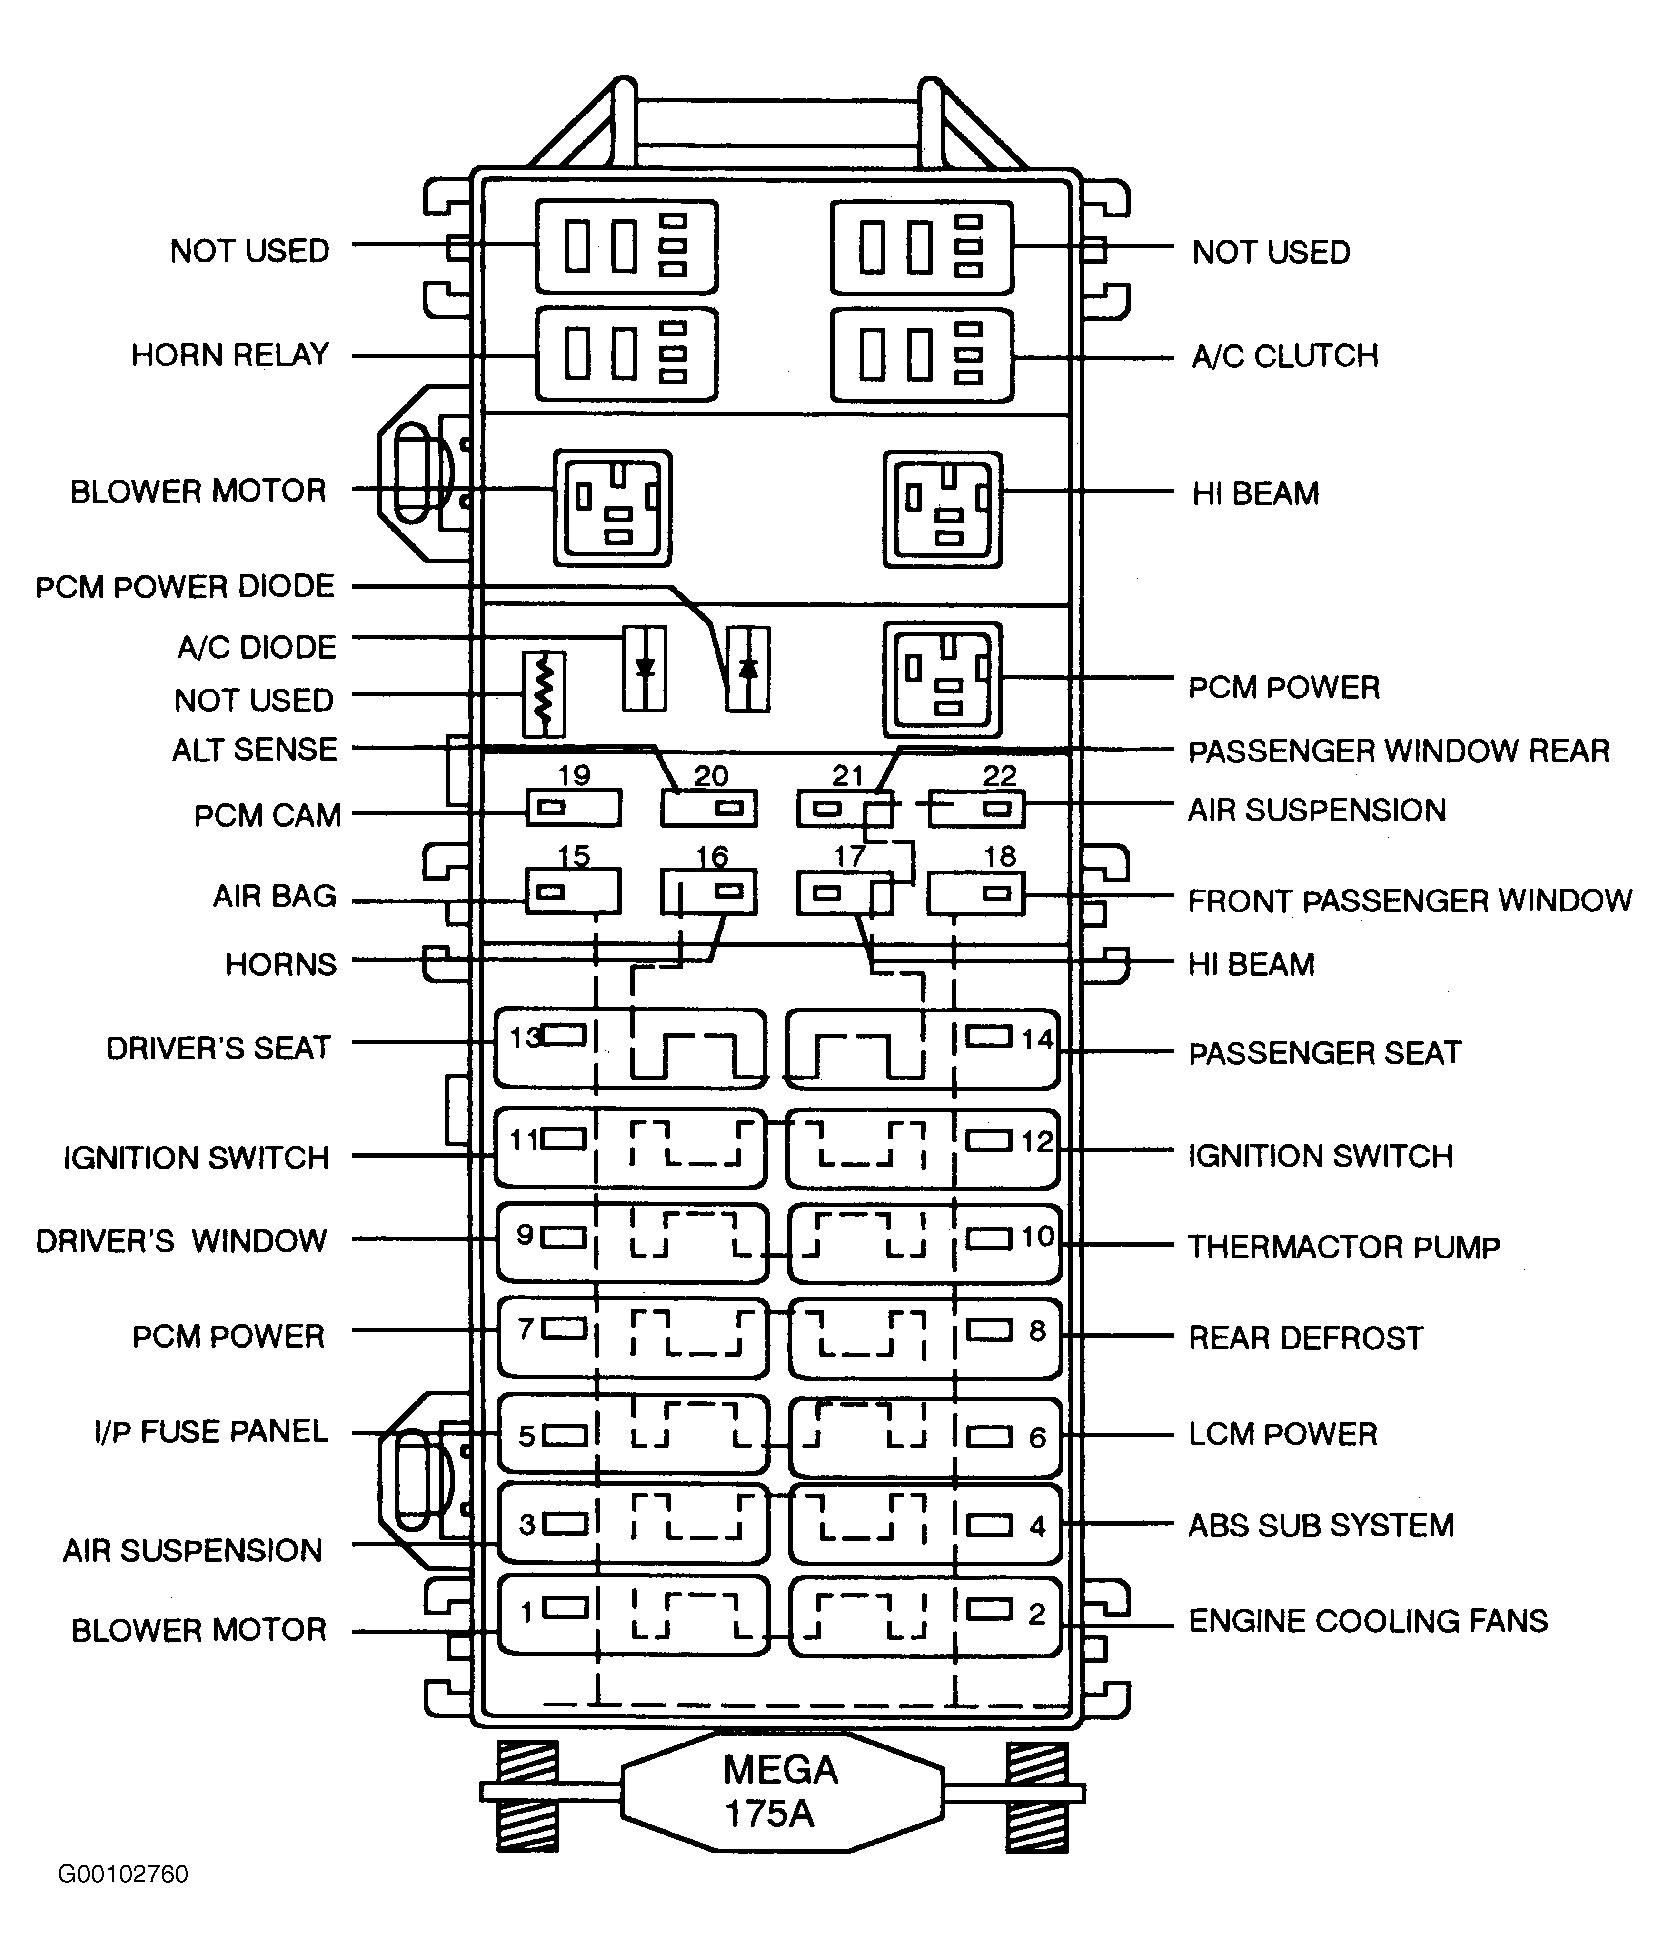 automotive fuse block diagram